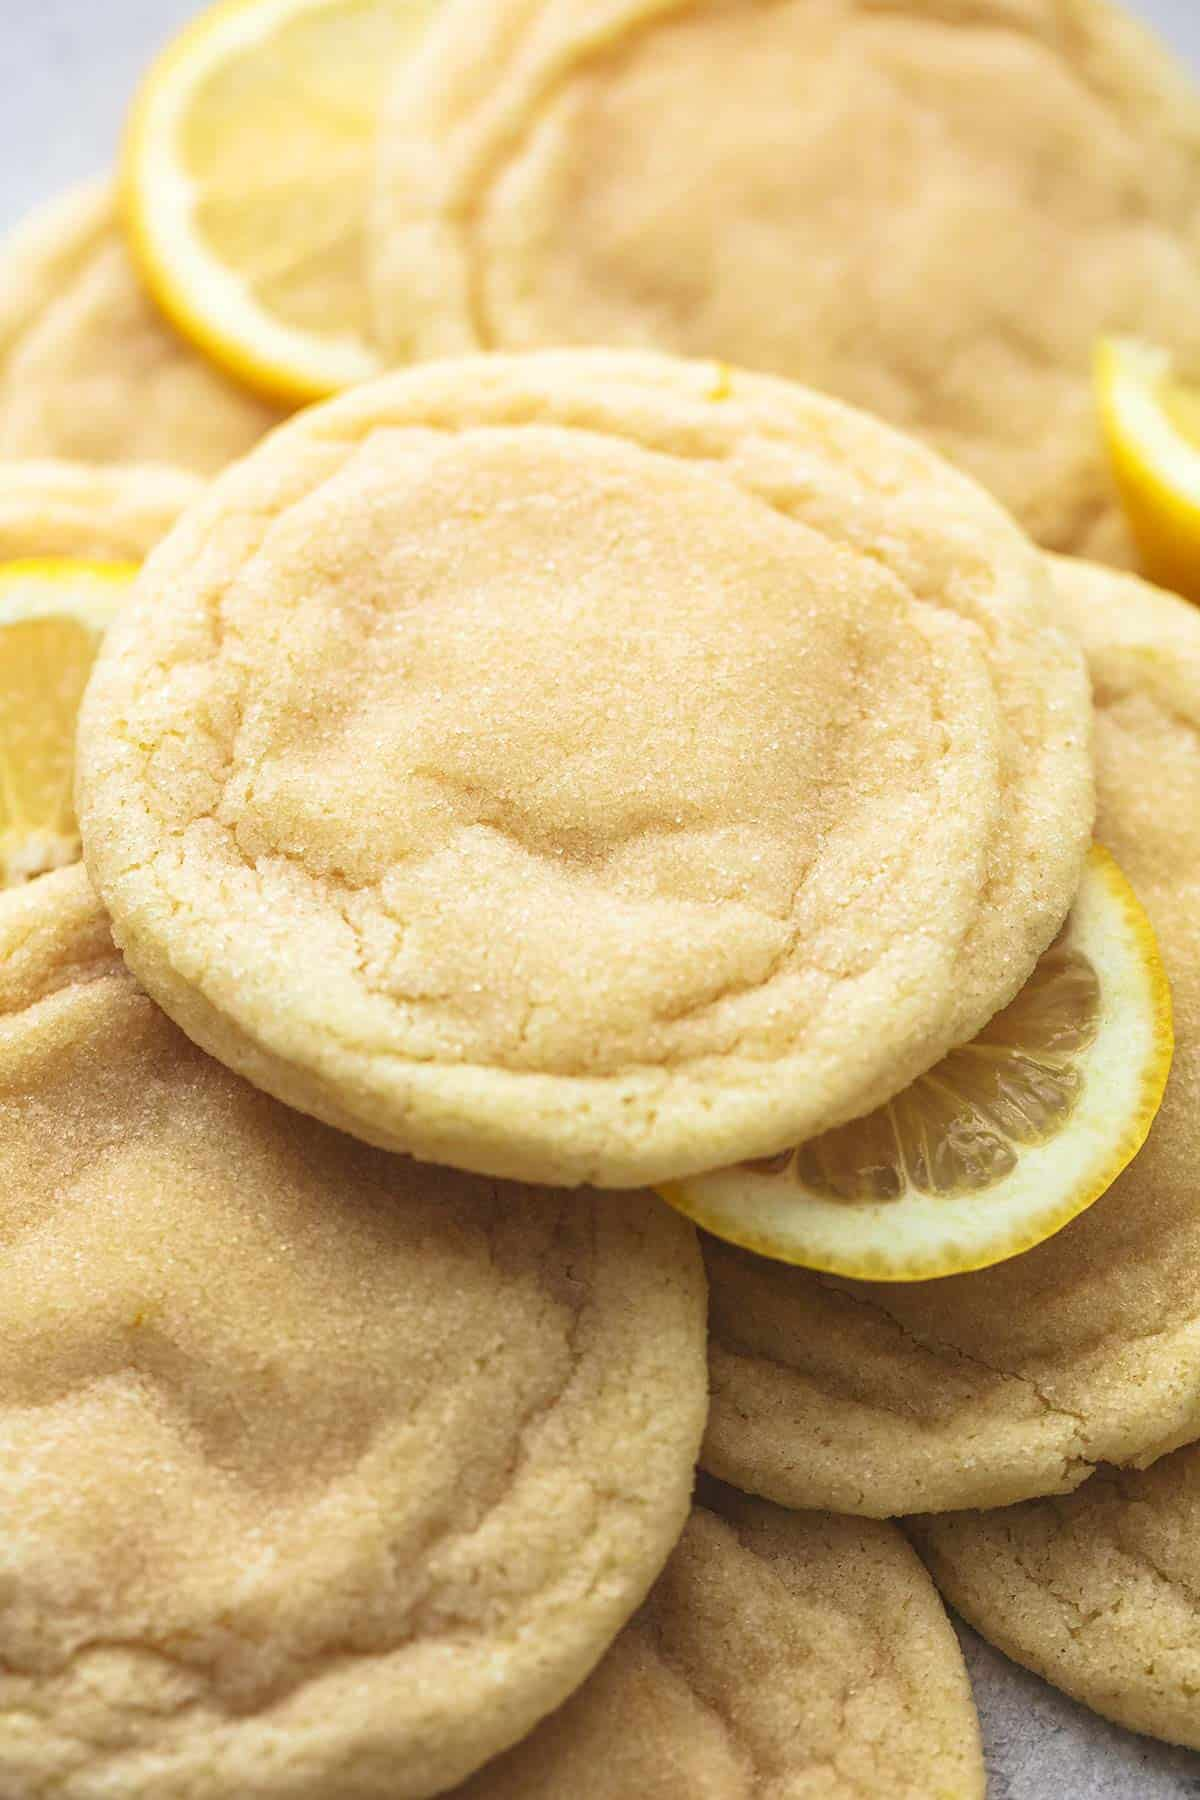 up close lemon sugar cookies with lemon slices